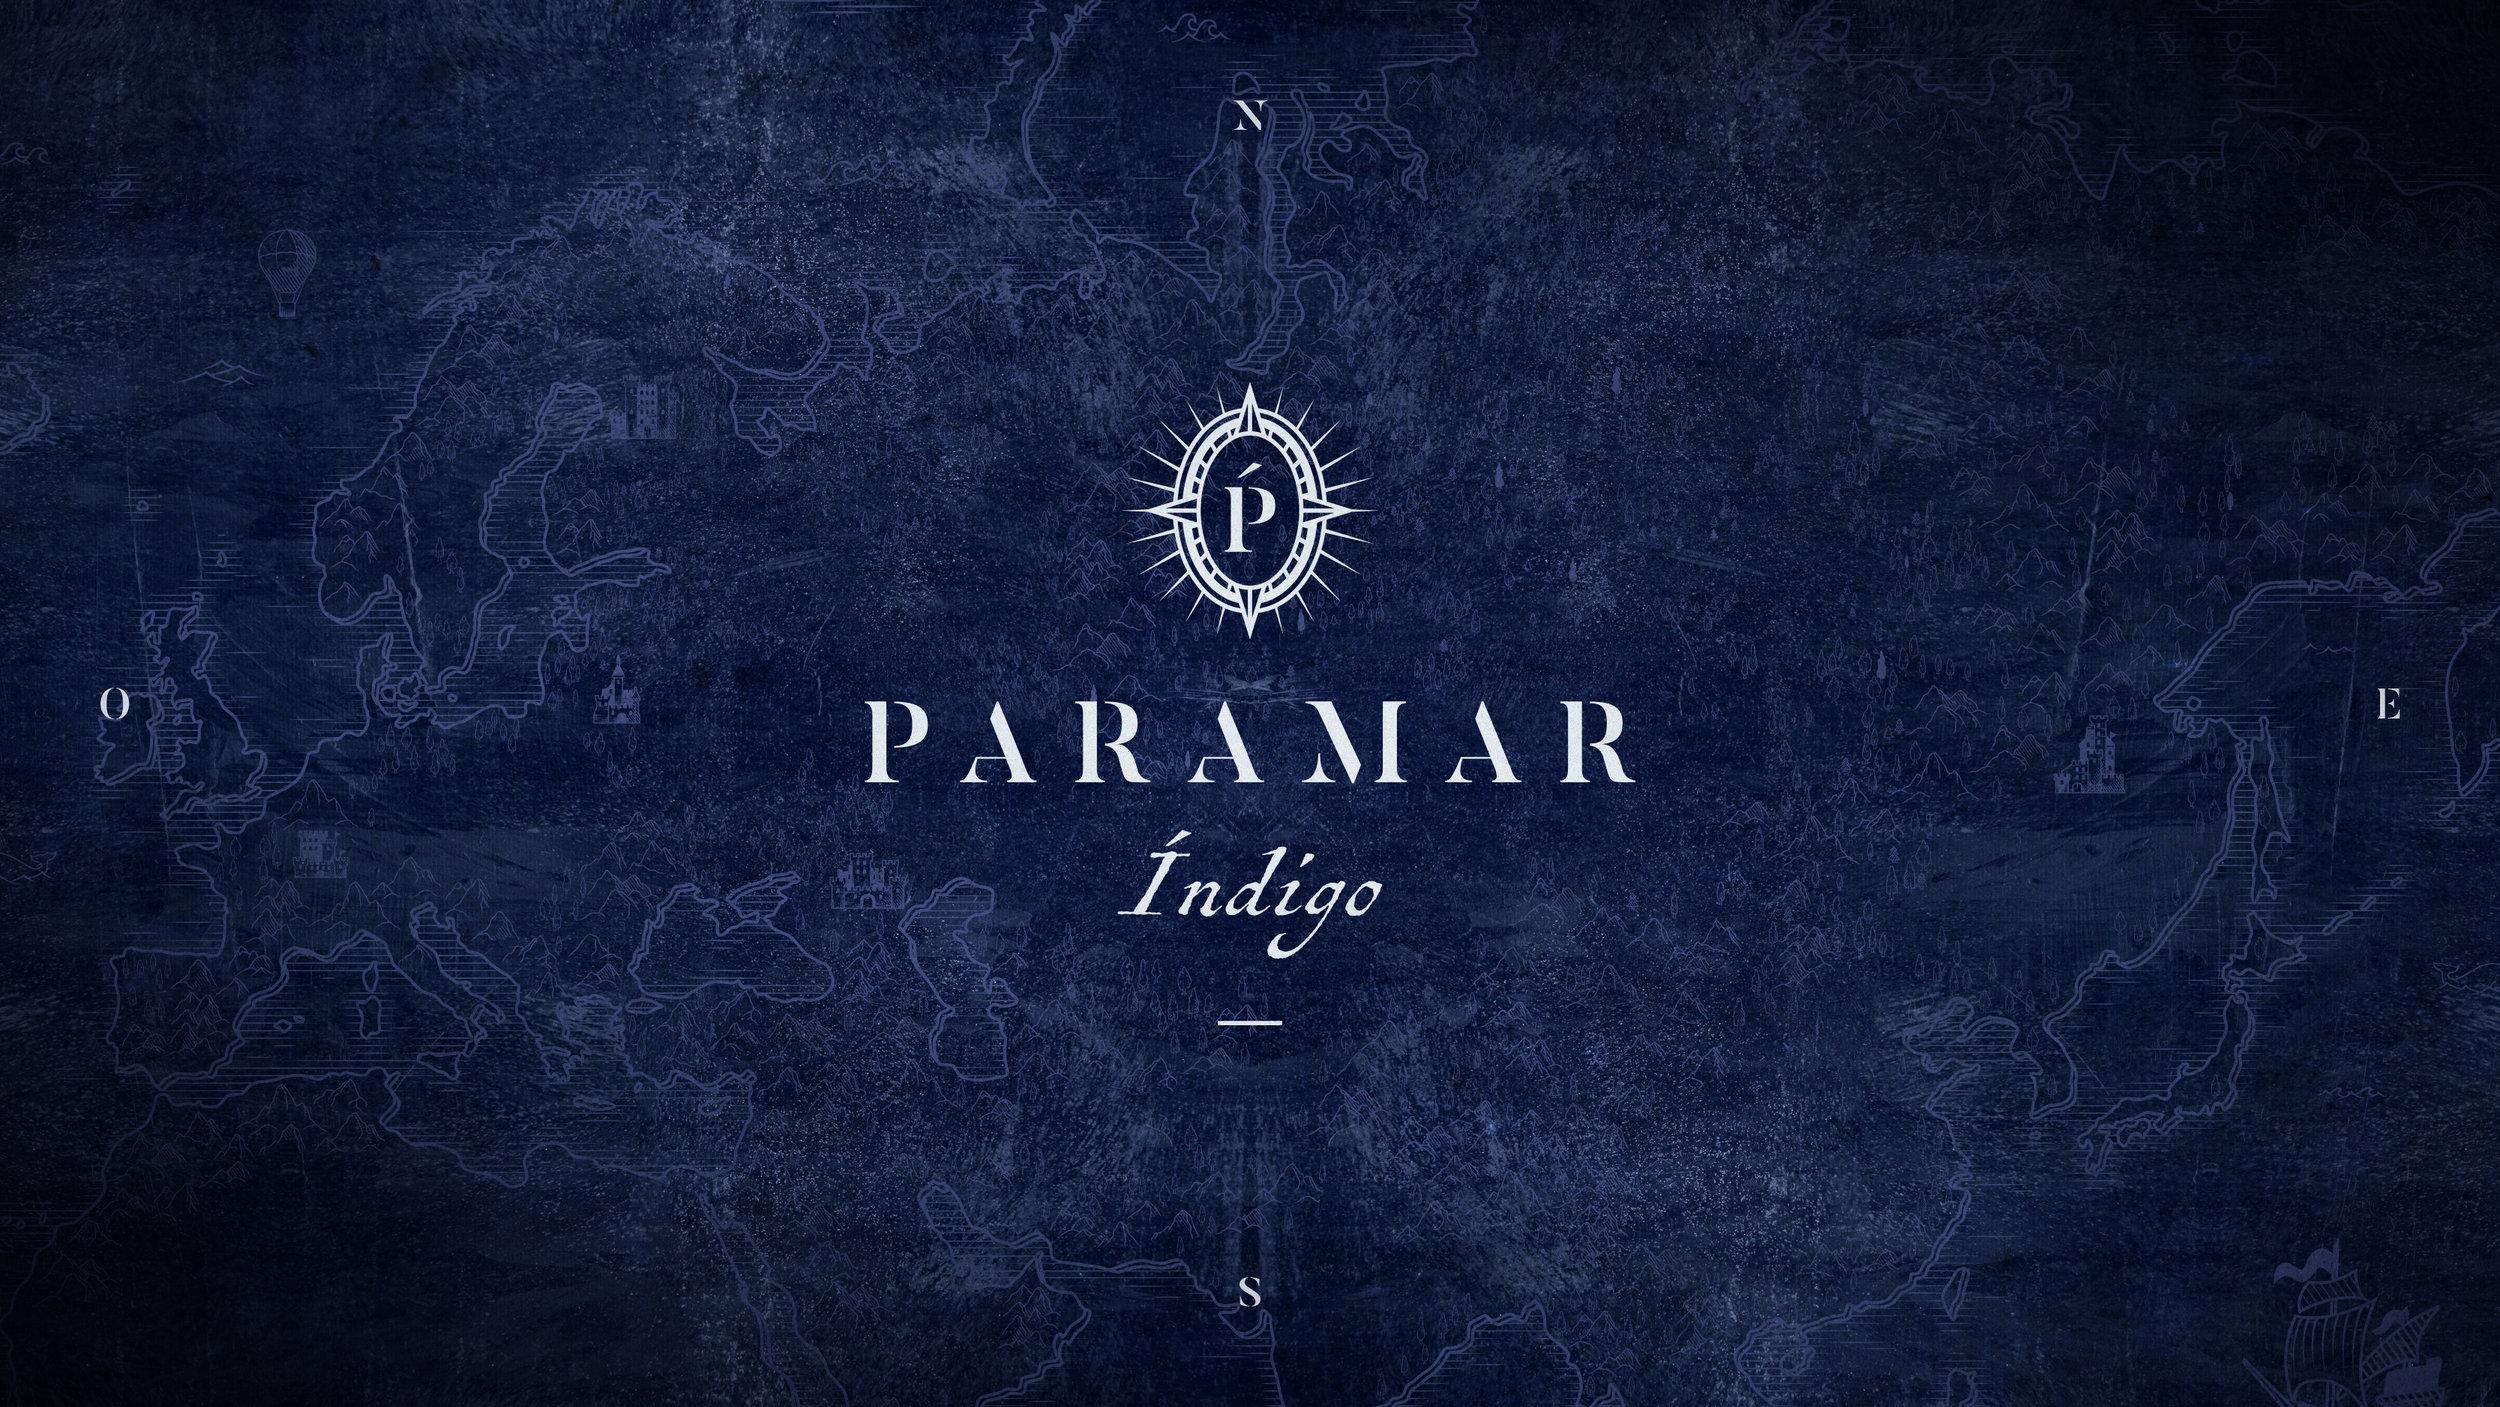 Paramar Índigo - 08 Portada 01.jpg